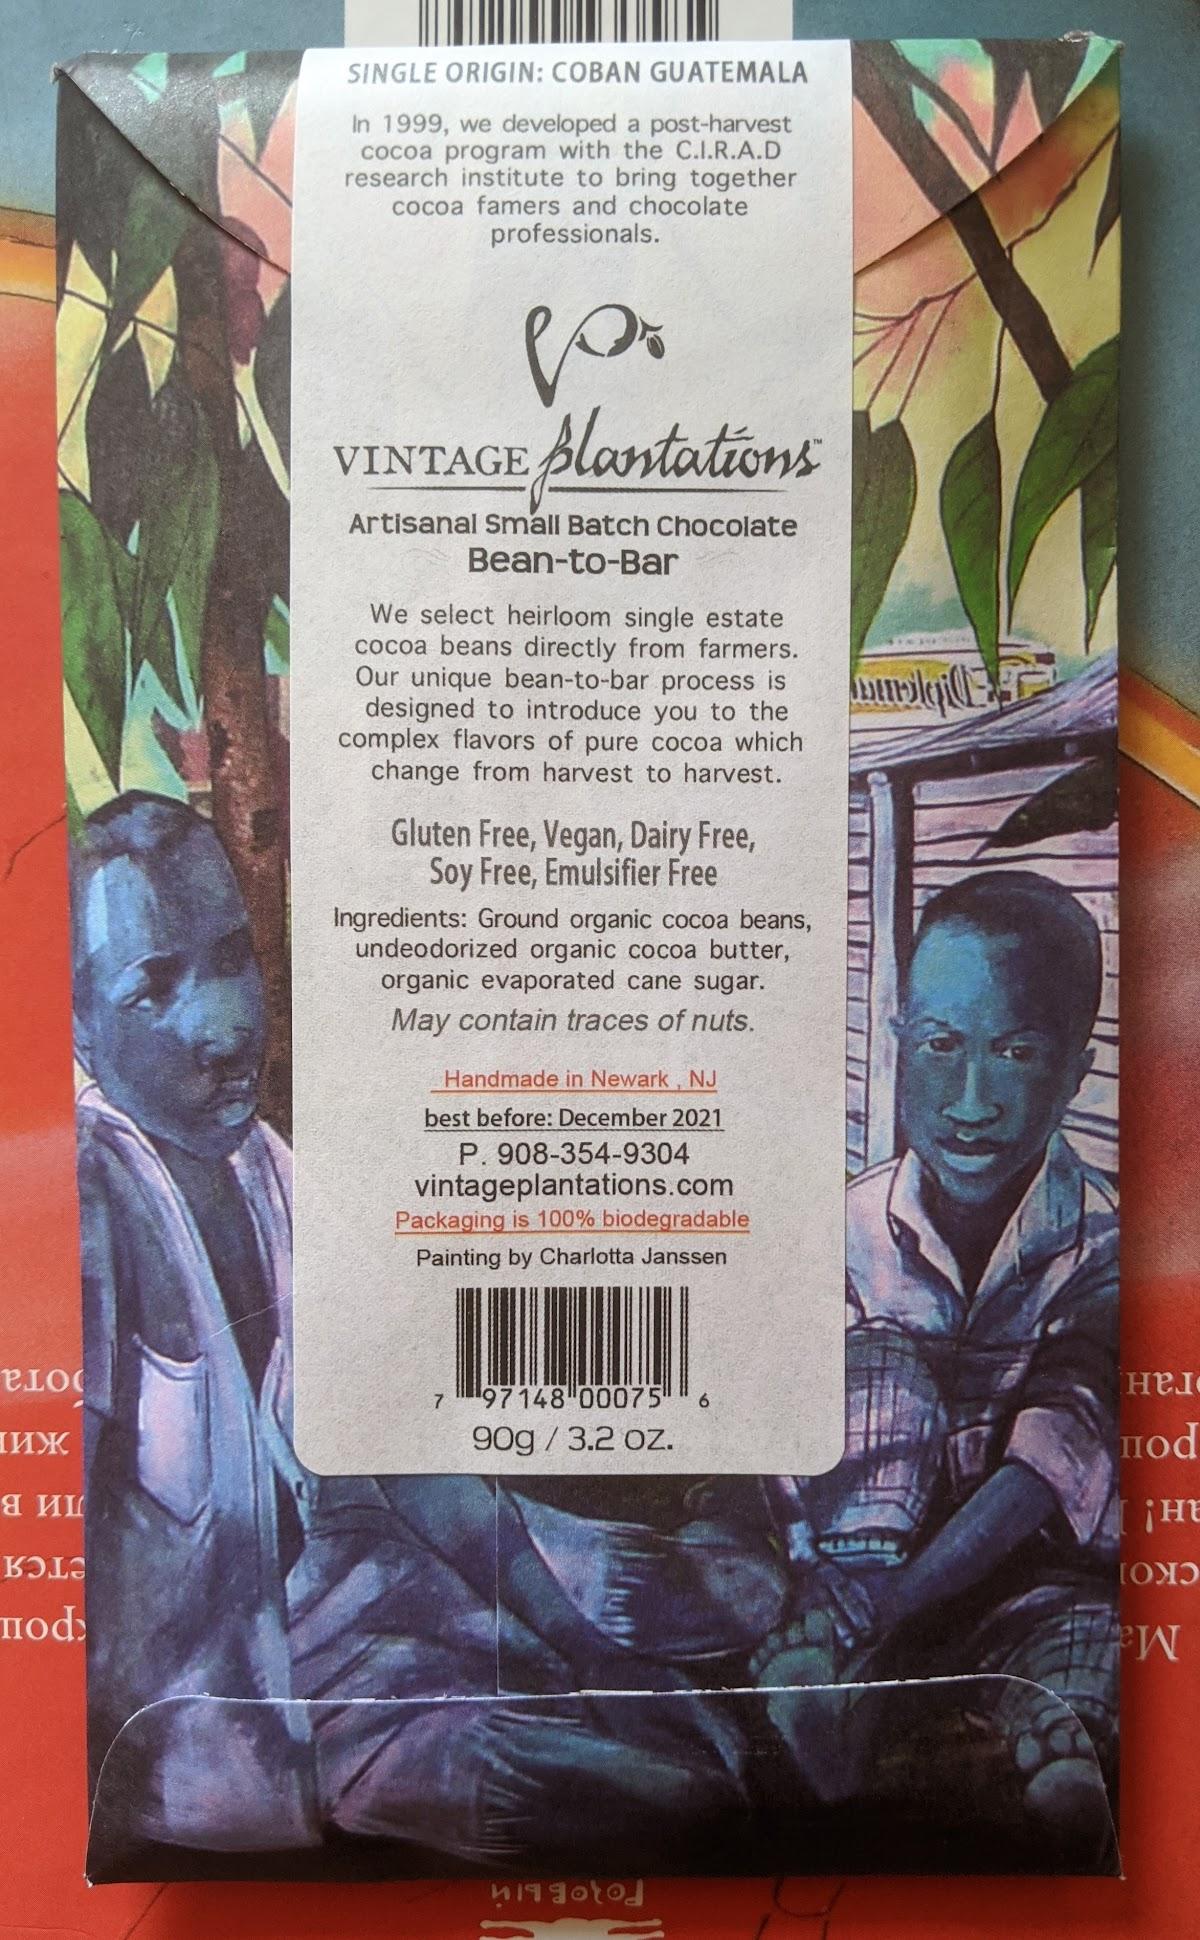 75% vintage plantations guatemala bar